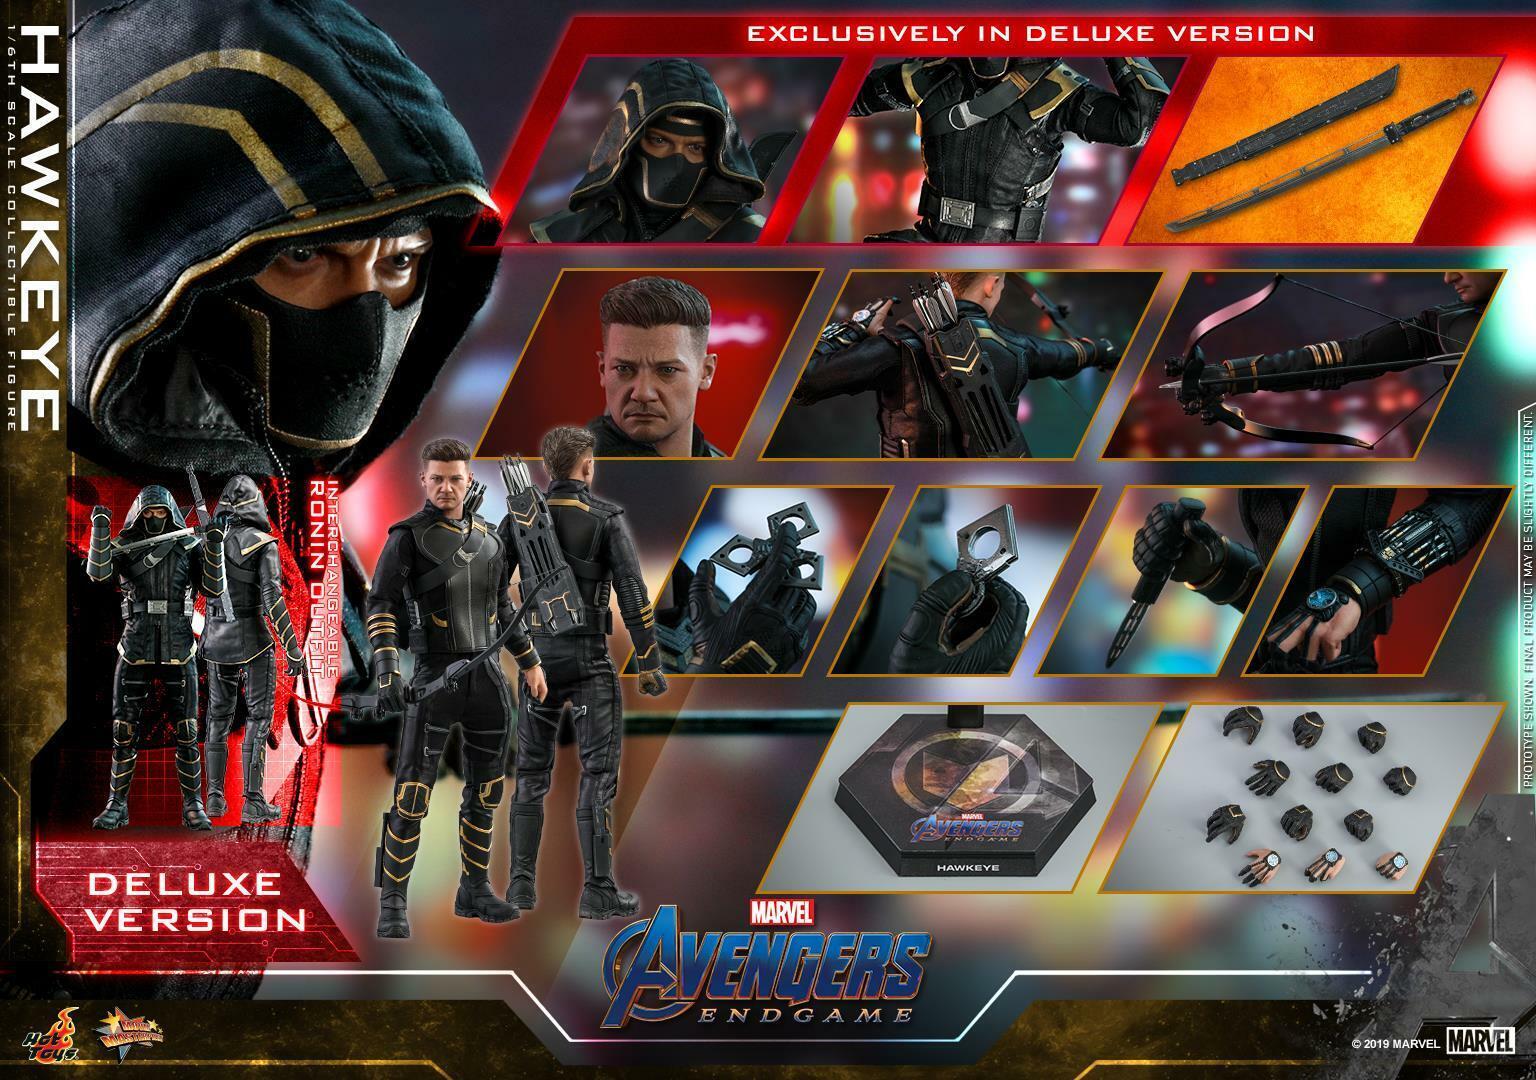 Hot Toys 1 6th scale Hawkeye (Deluxe Version) Avengers Endgame Endgame Endgame Figure MMS532 32d360